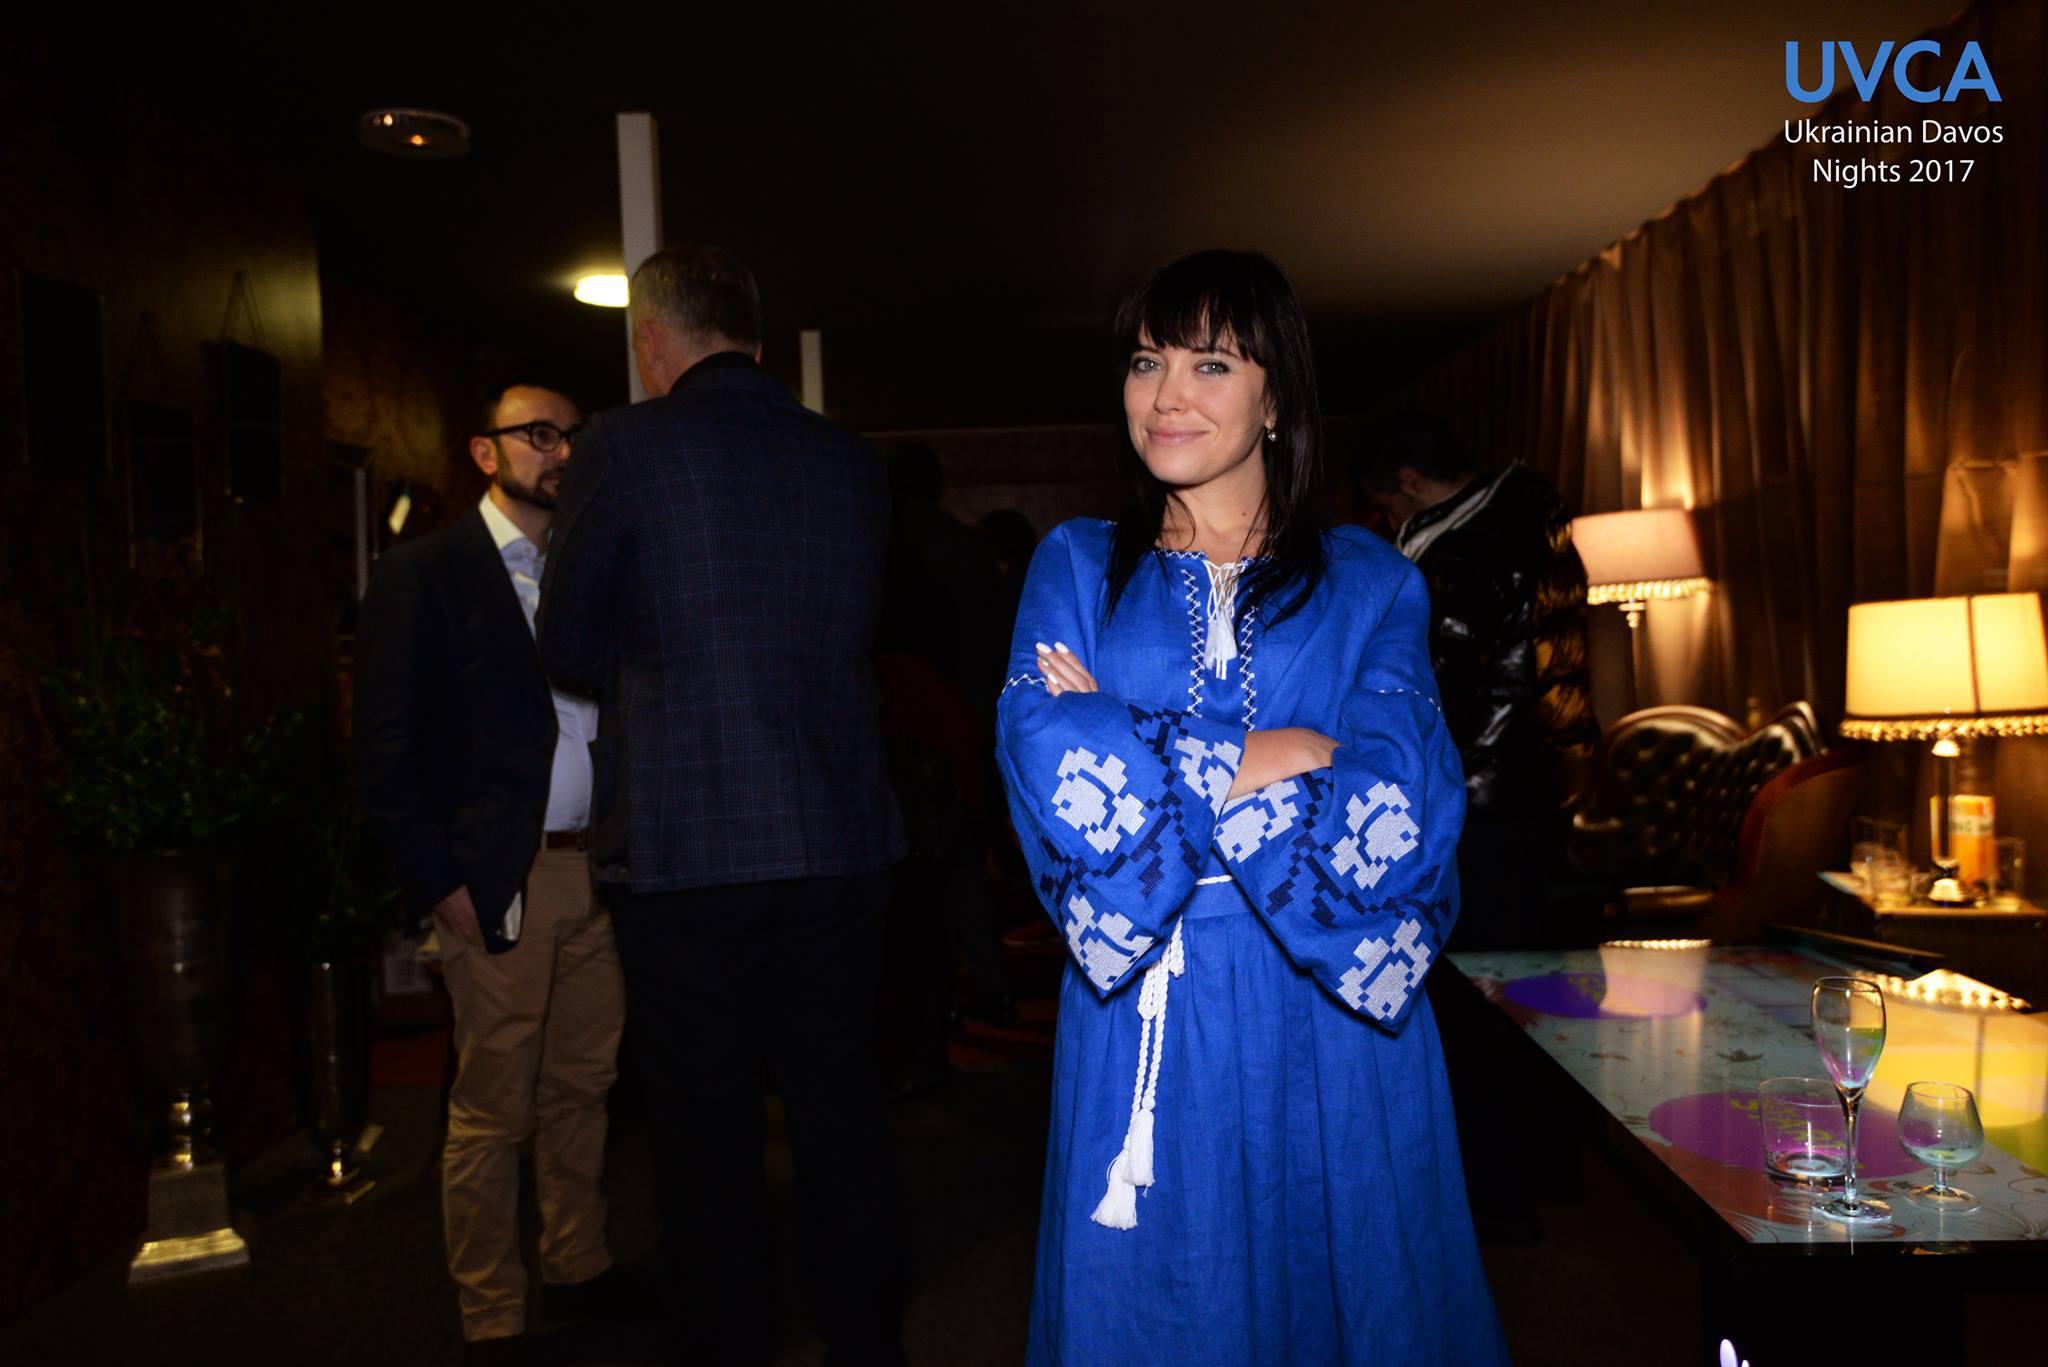 Davos Nights Ольга Афанасьєва